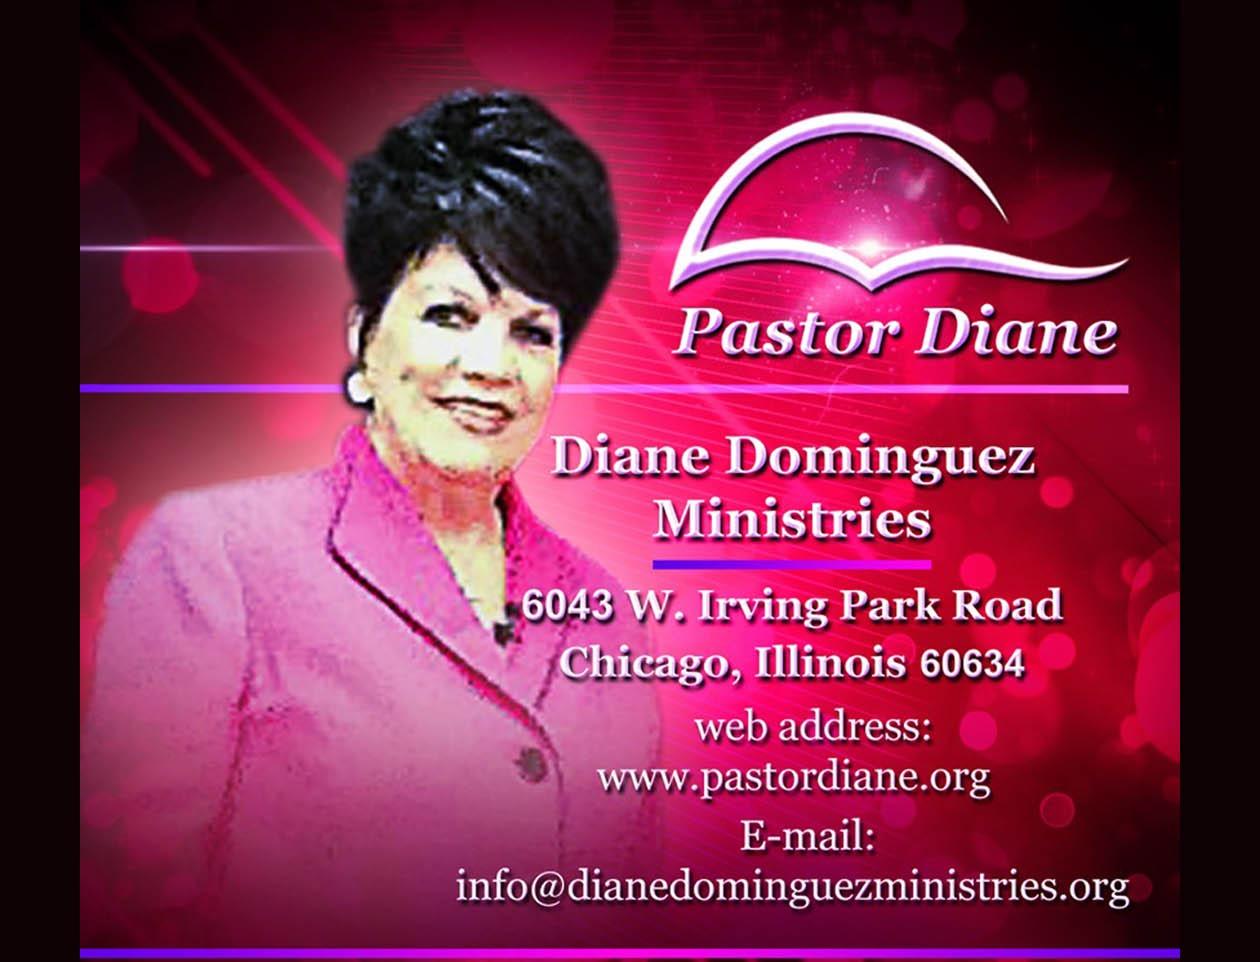 Pastor Diane Dominguez